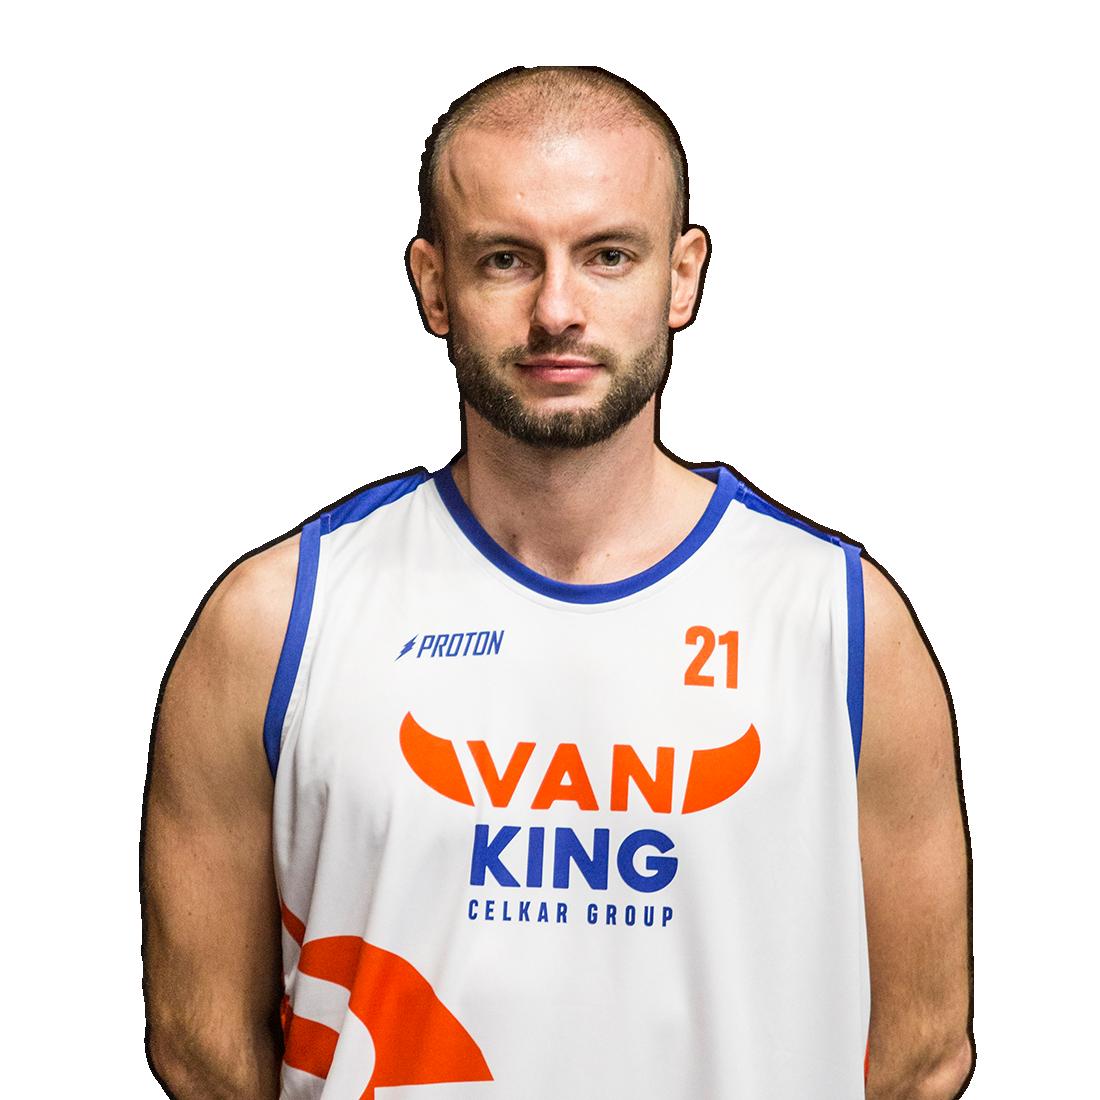 Damian Marcinowski